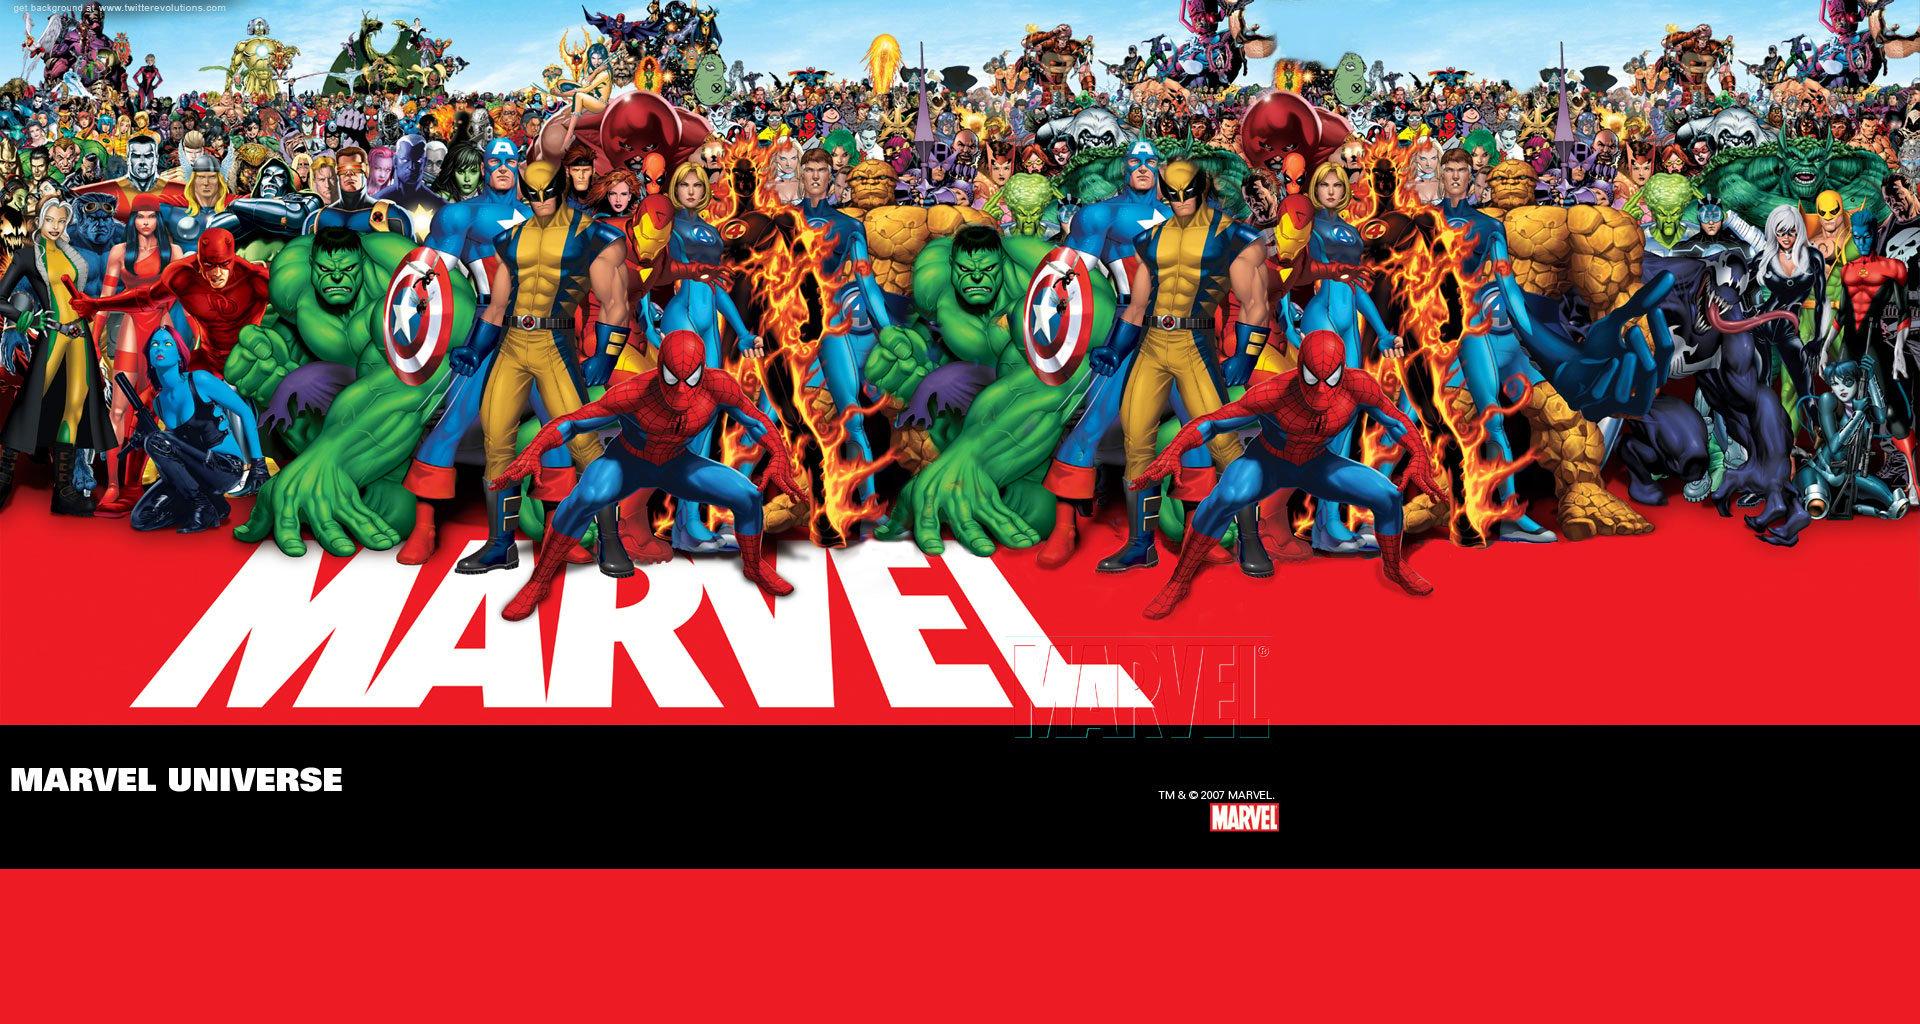 All marvel characters wallpaper wallpapersafari - All marvel heroes wallpaper ...